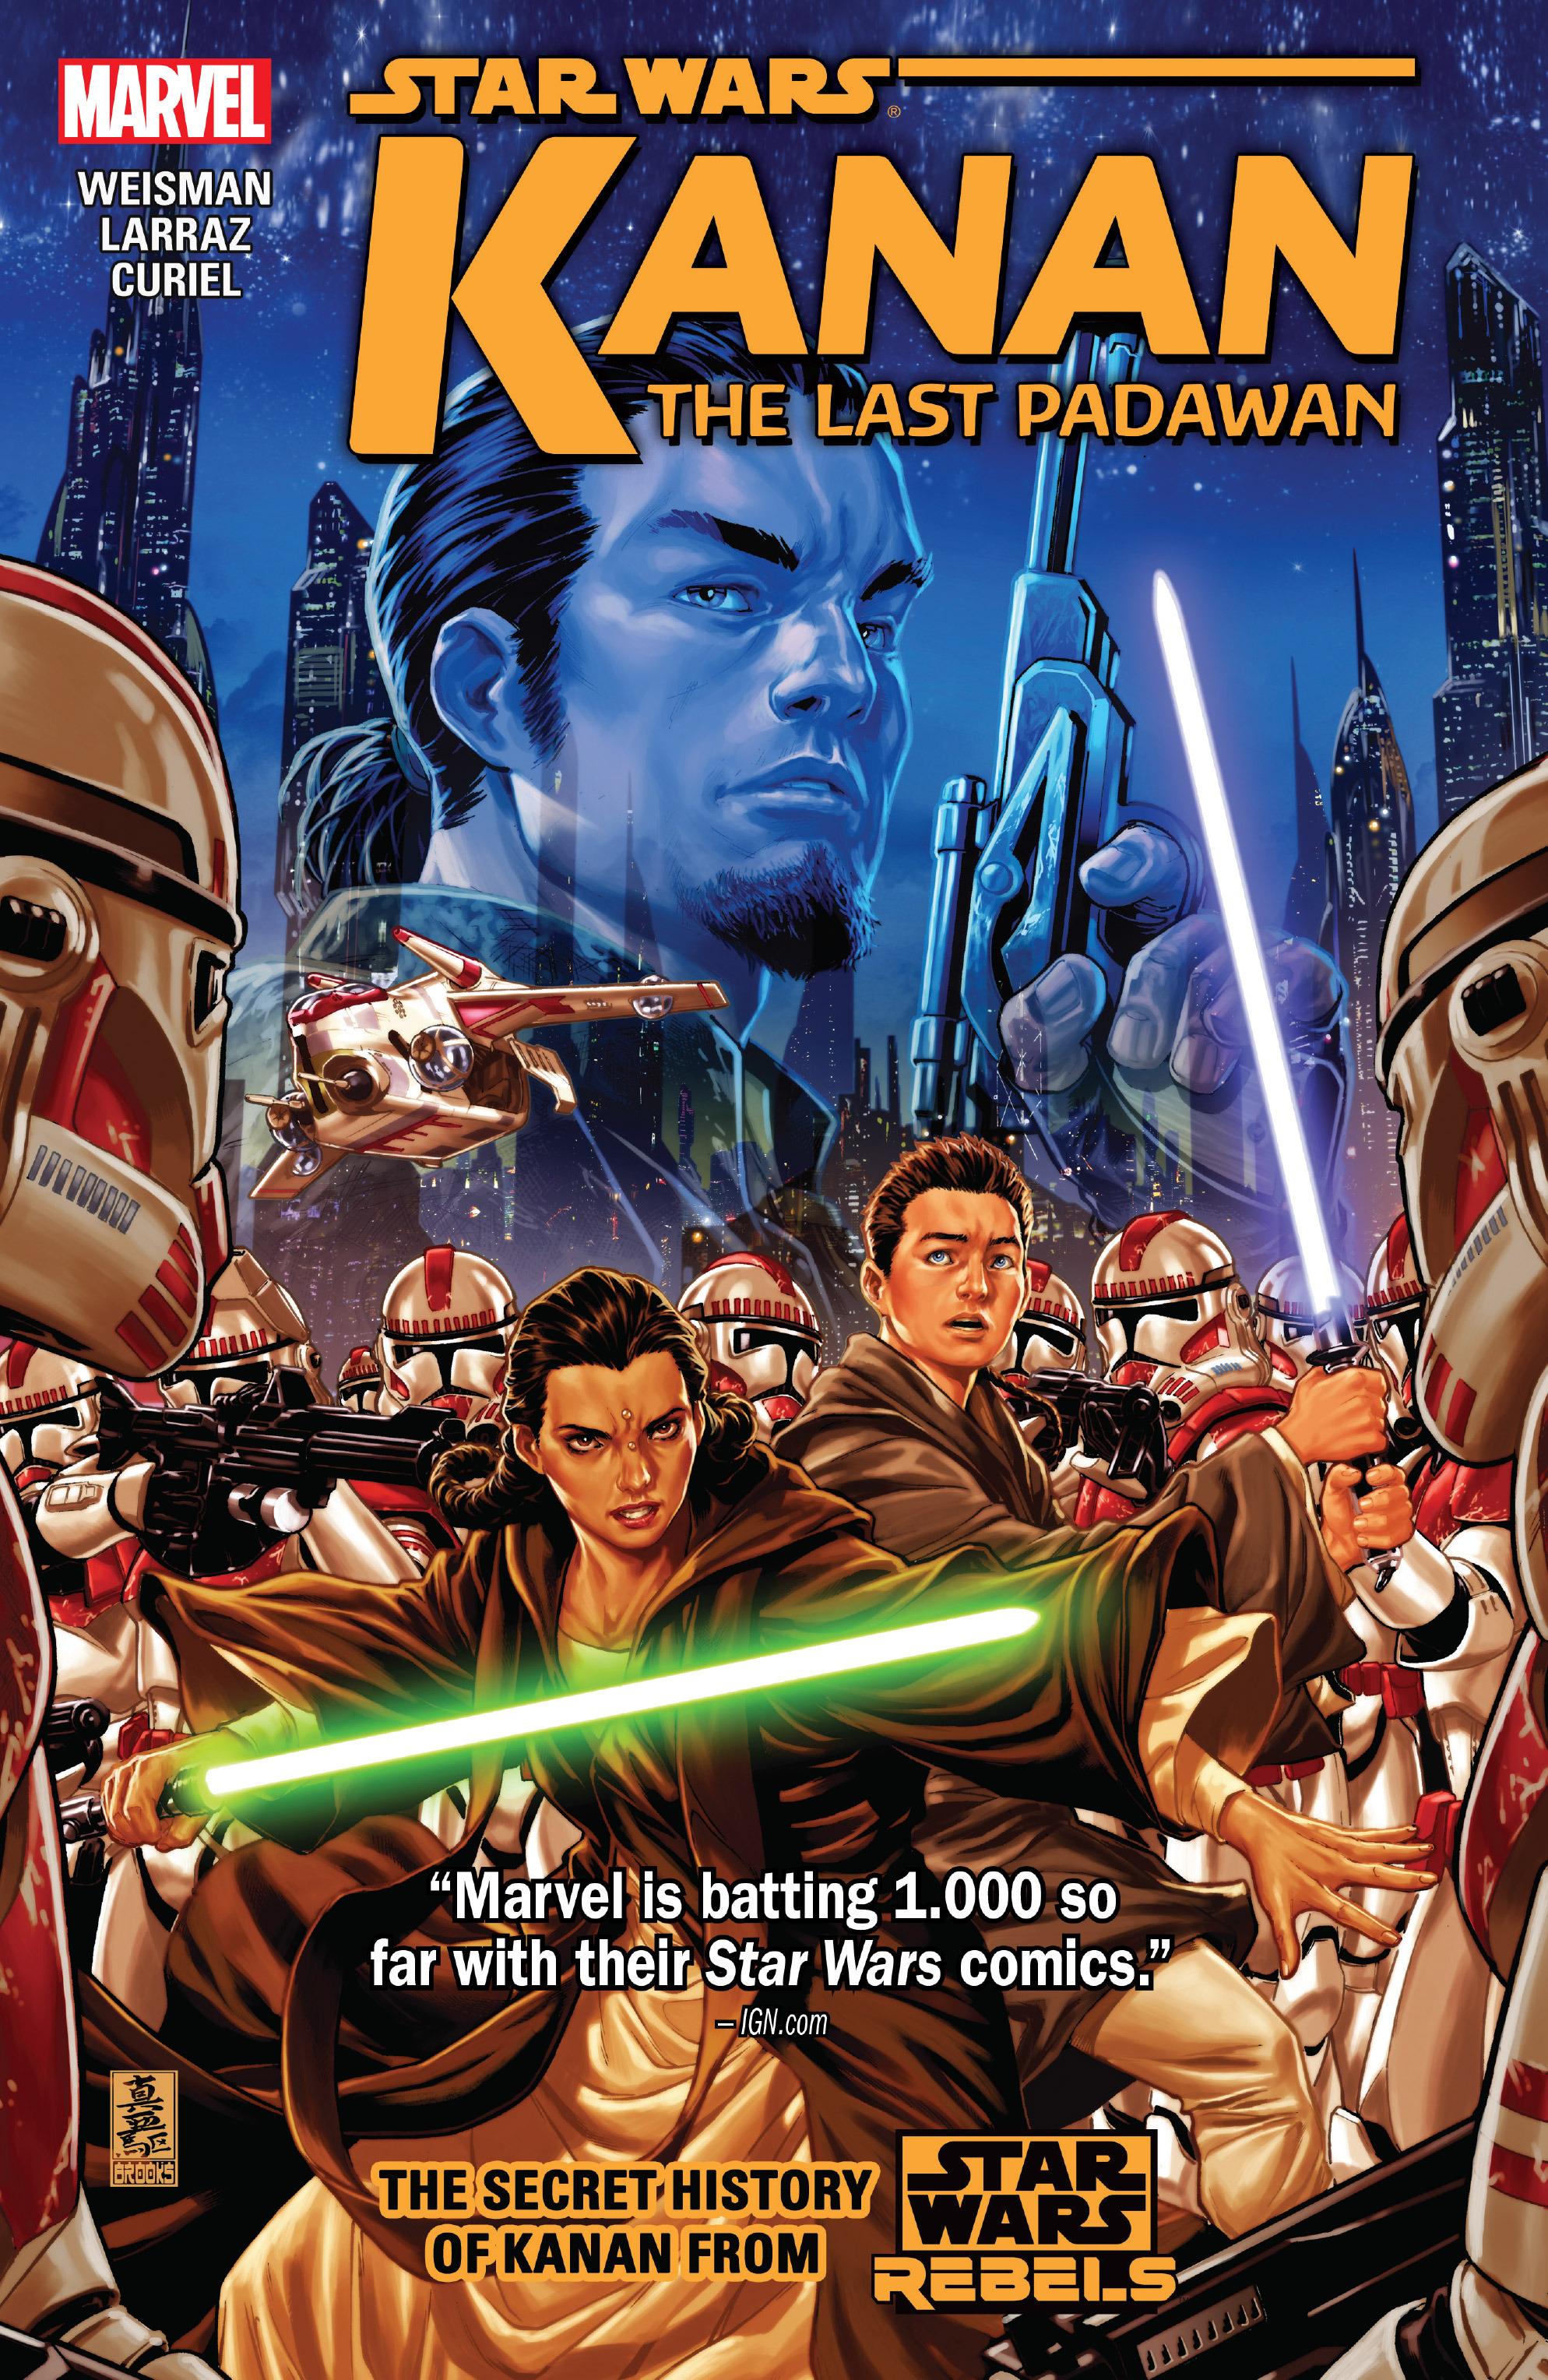 Star Wars - Kanan Cover